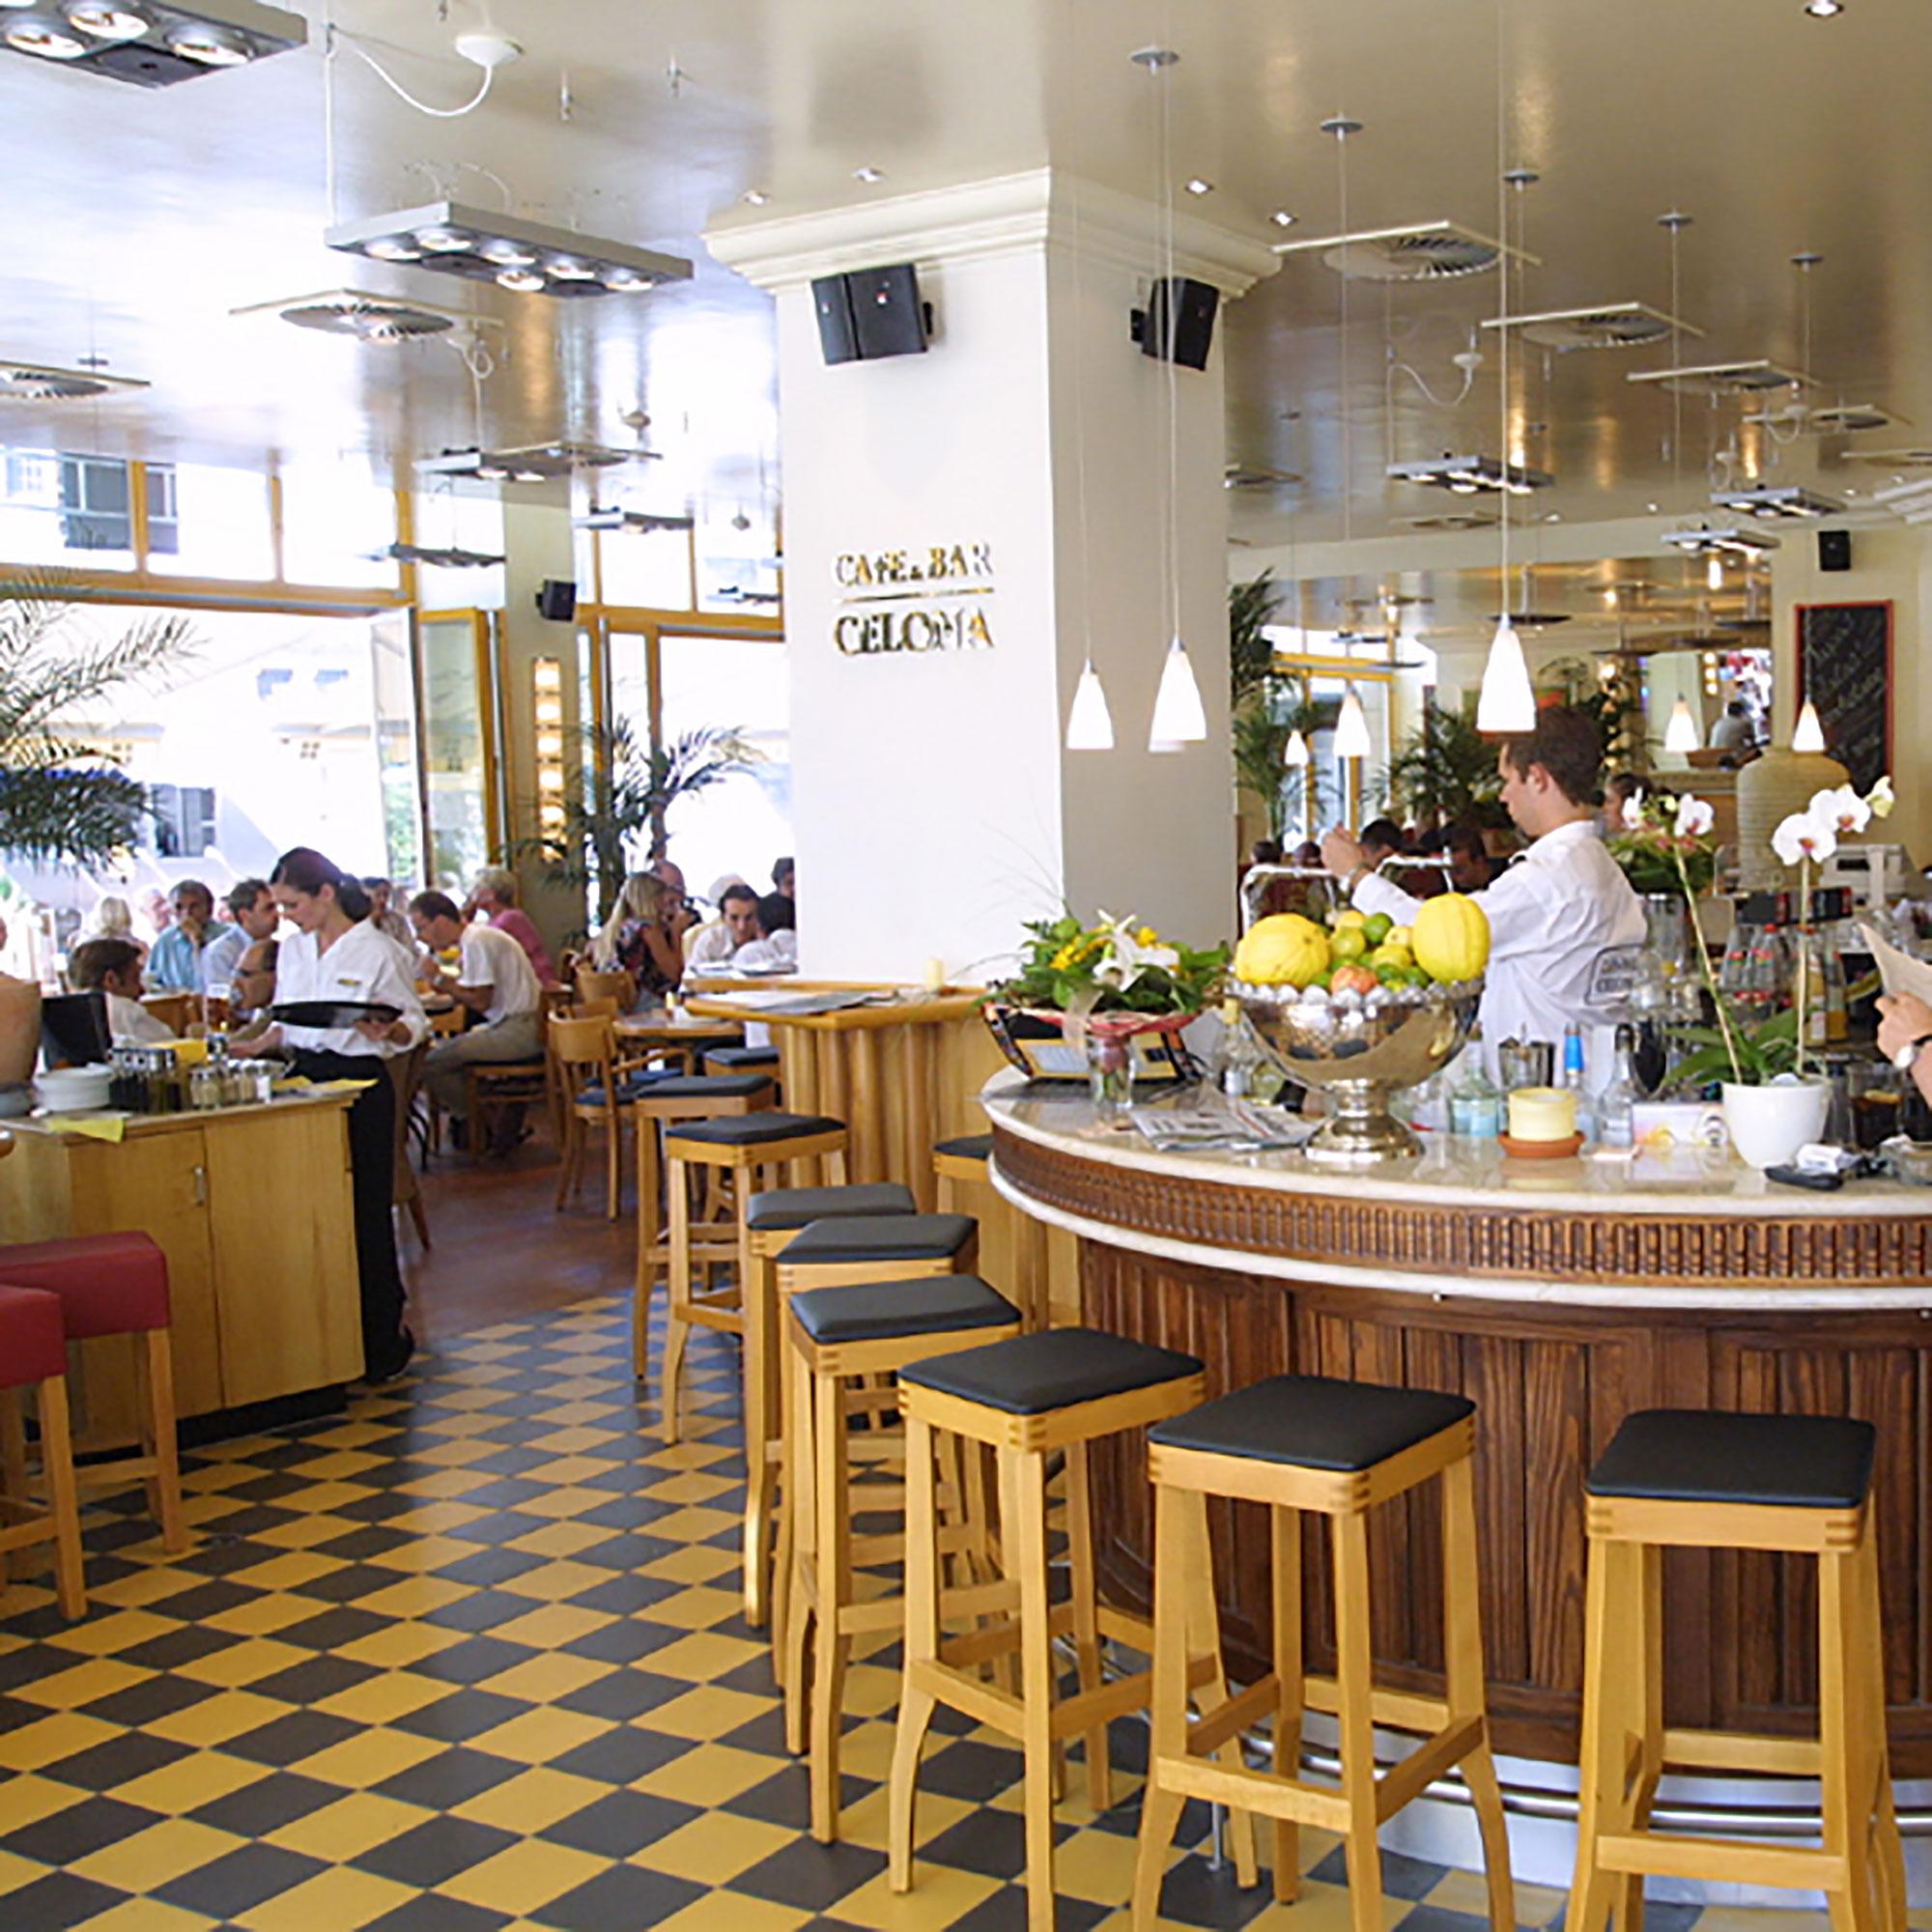 Cafe Und Bar Celona Paderborn